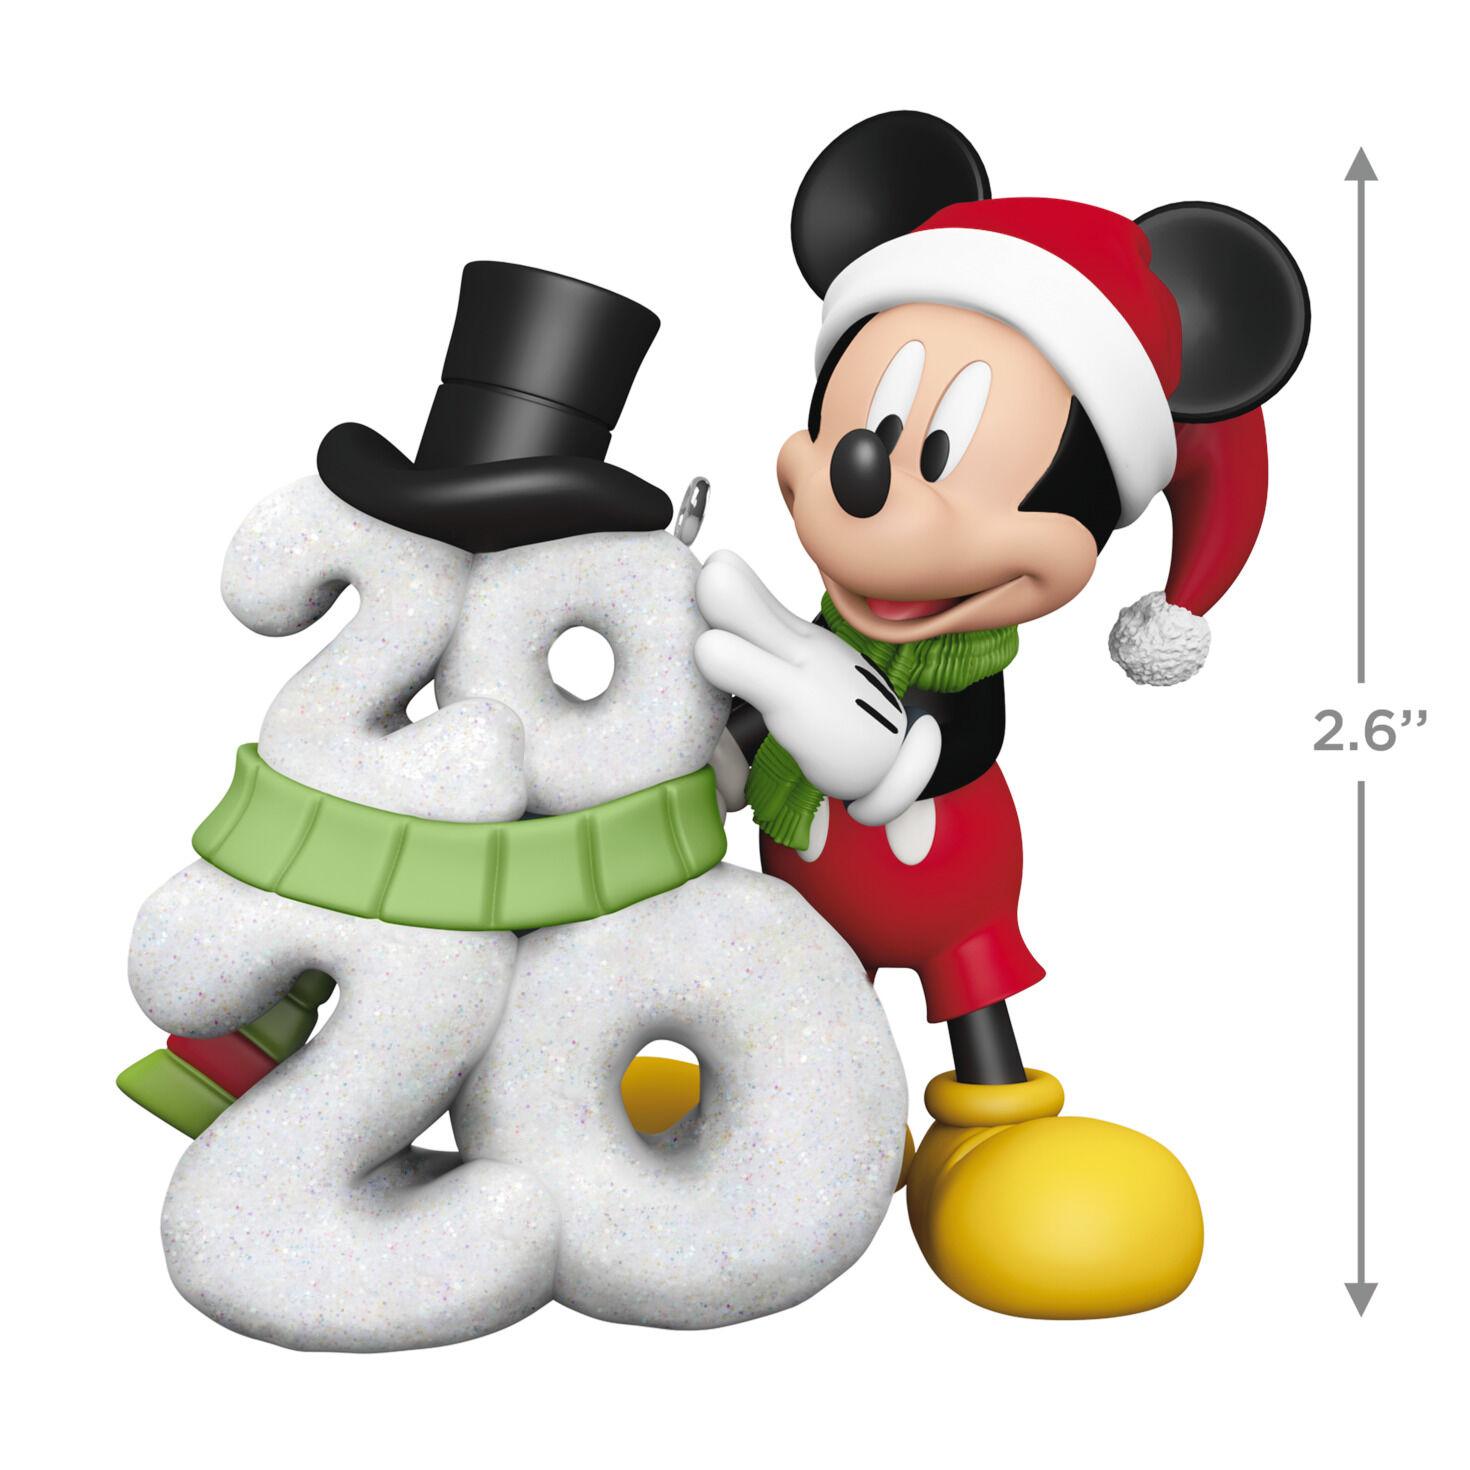 Disney Mickey Mouse A Year Of Disney Magic 2020 Ornament Keepsake Ornaments Hallmark